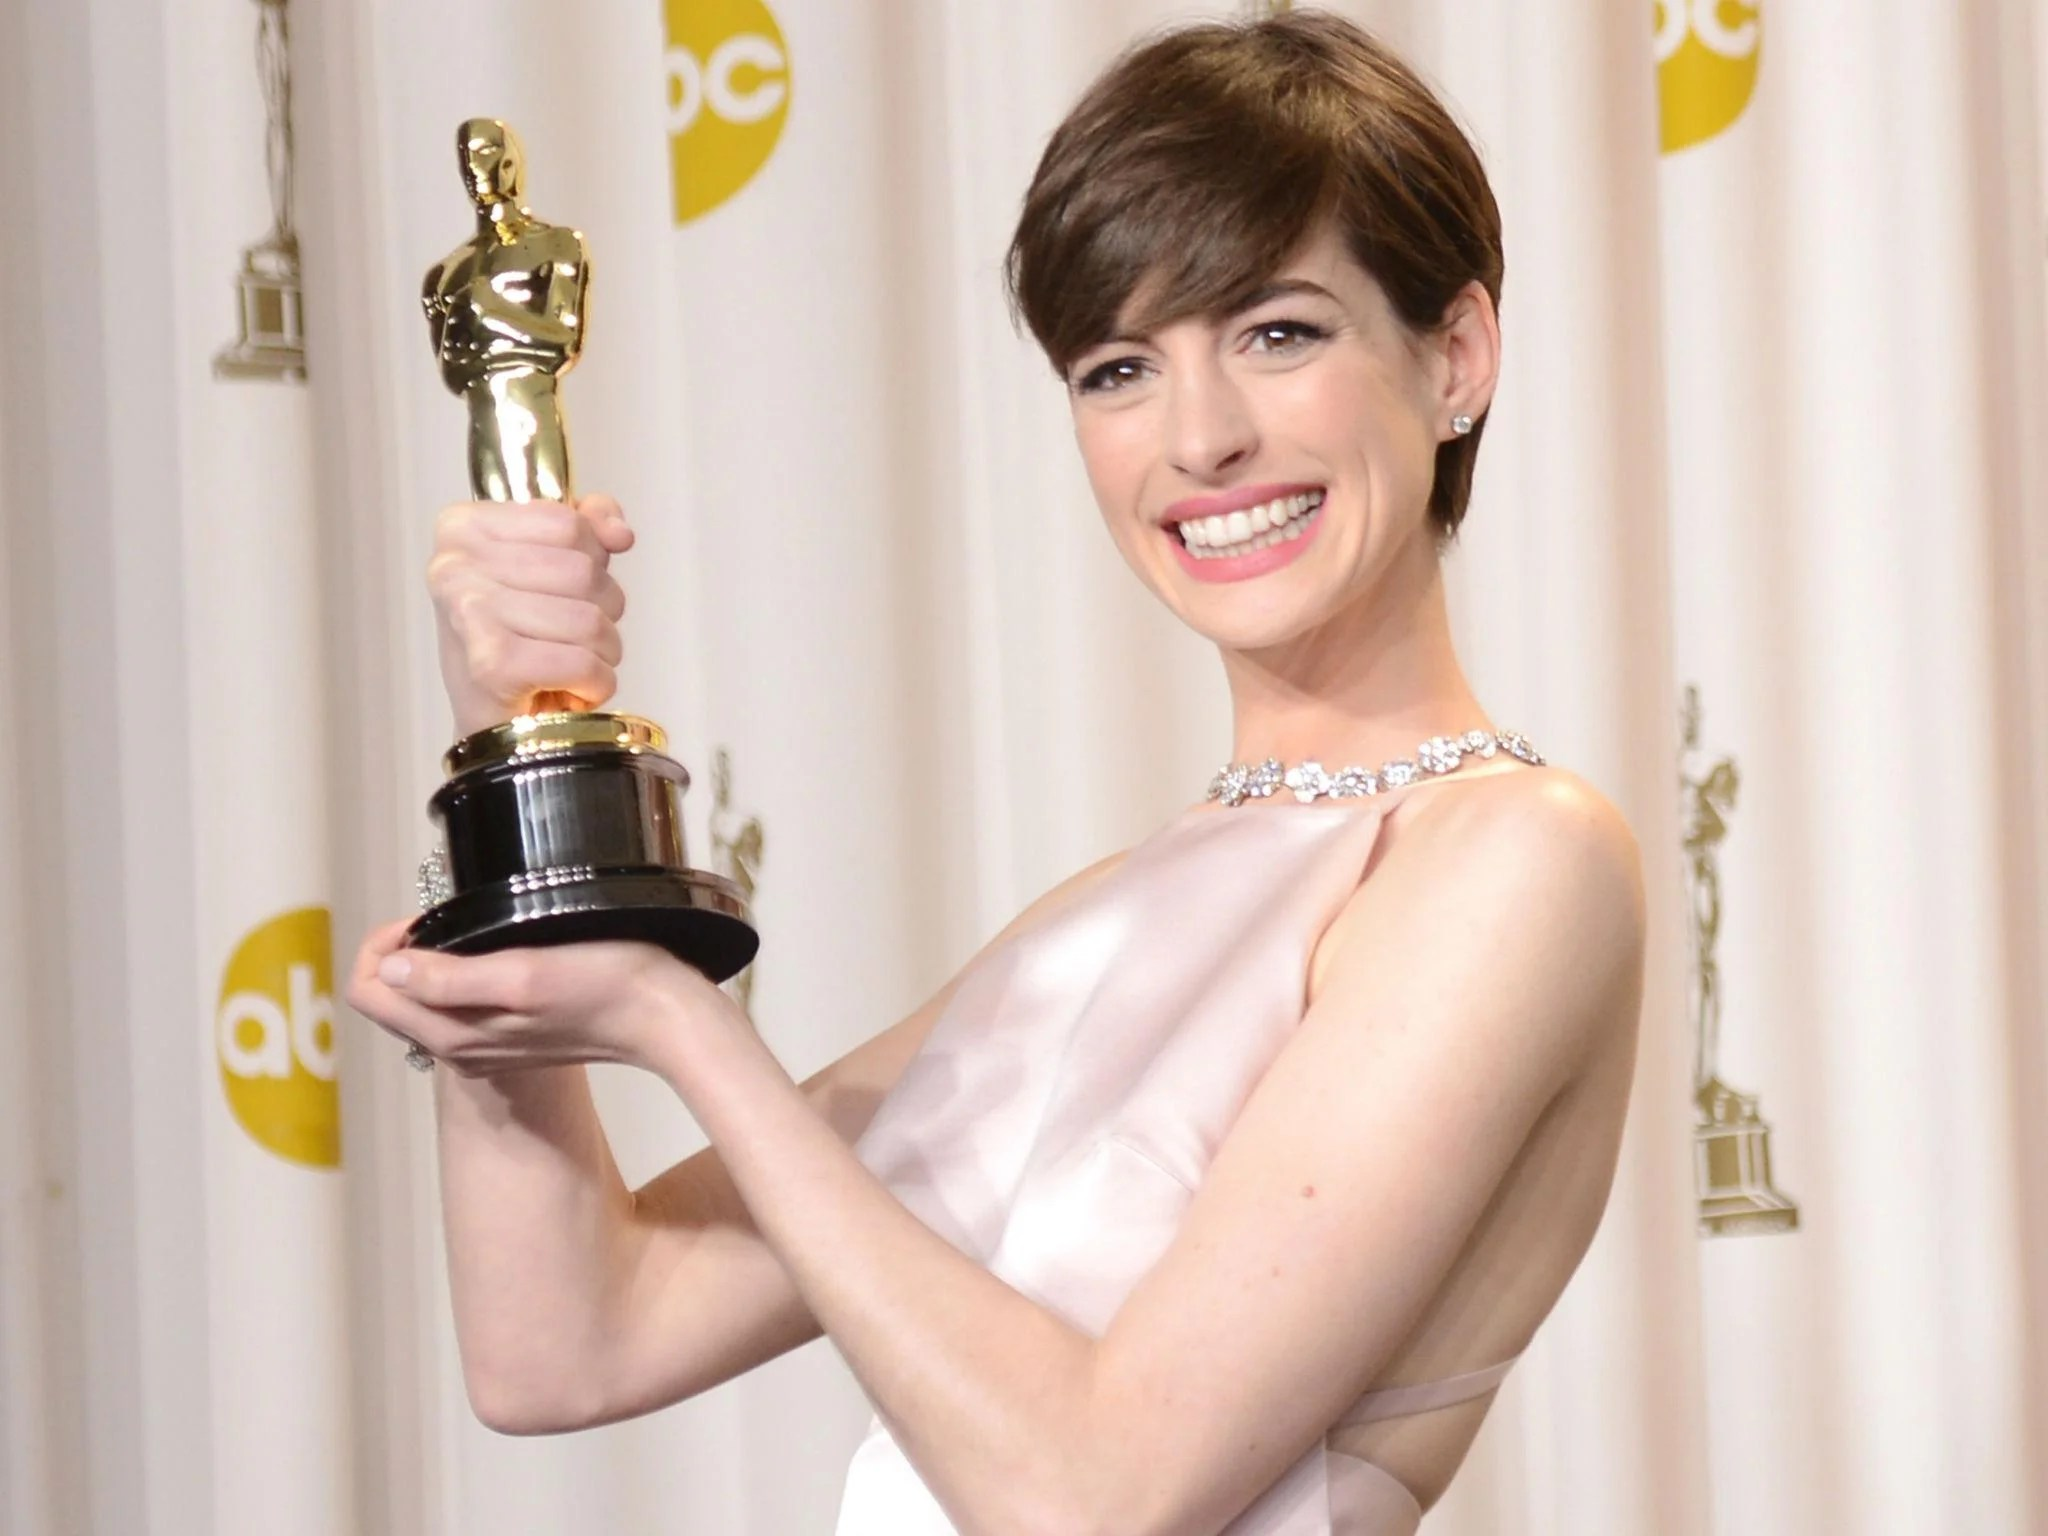 2018 Indy Car Wallpaper Anne Hathaway I Wasn T Happy When I Won My Oscar For Les